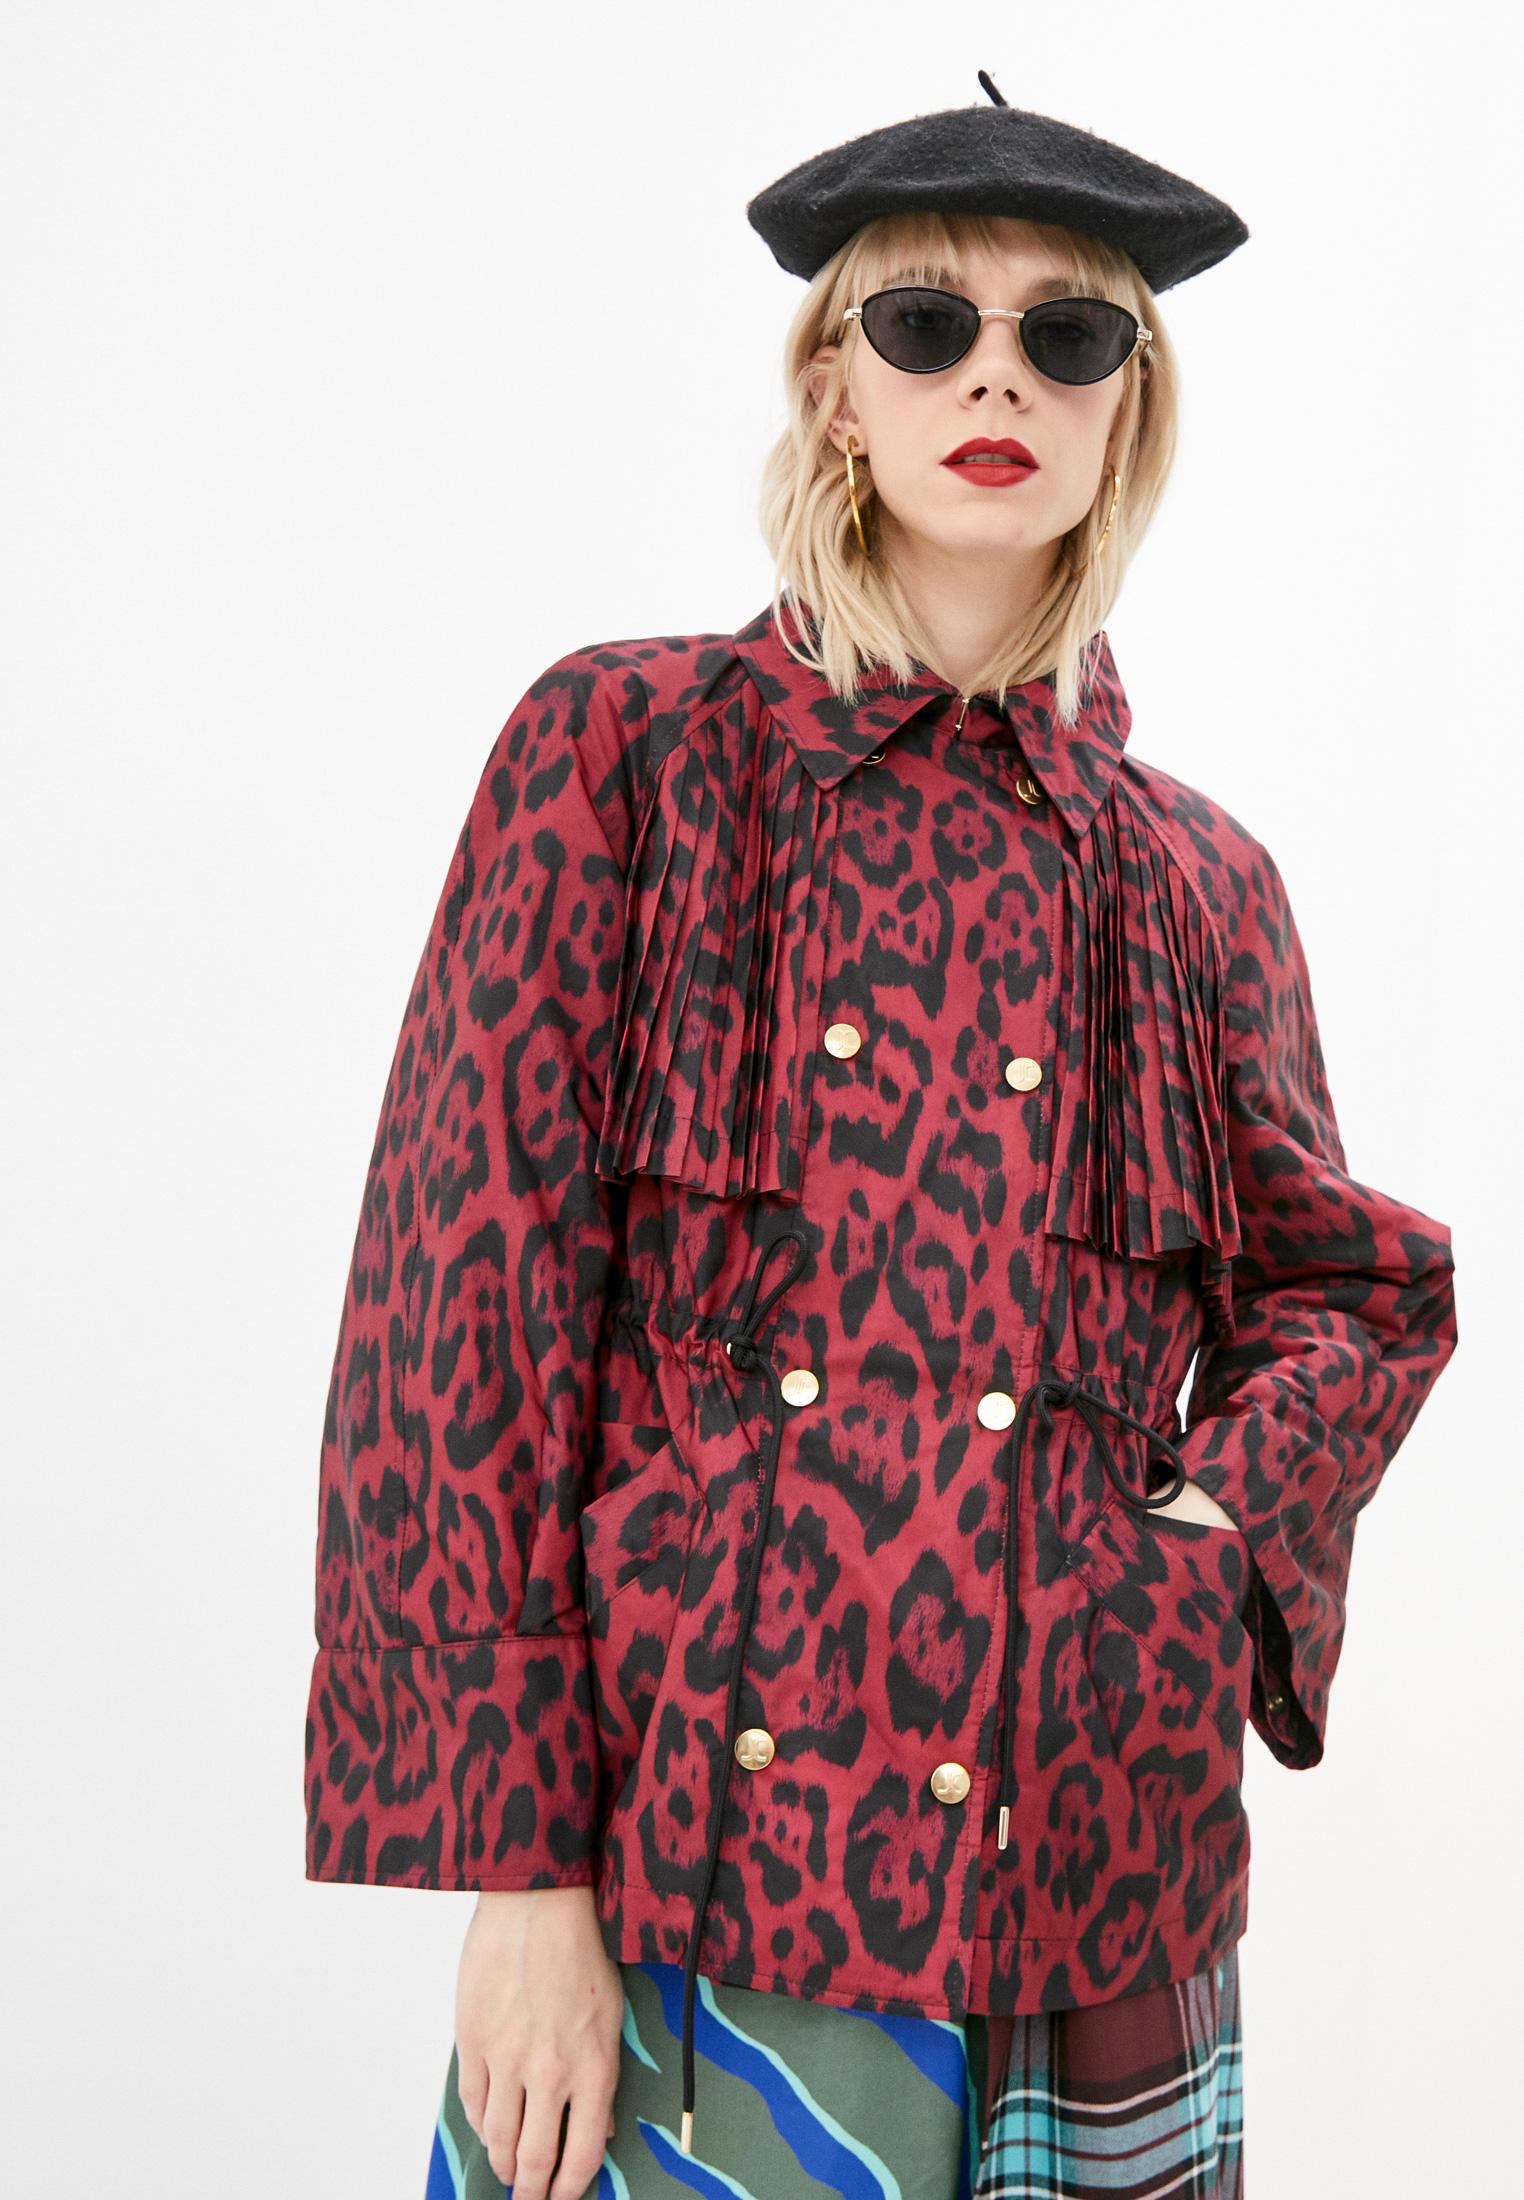 Утепленная куртка Just Cavalli (Джаст Кавалли) Куртка утепленная Just Cavalli